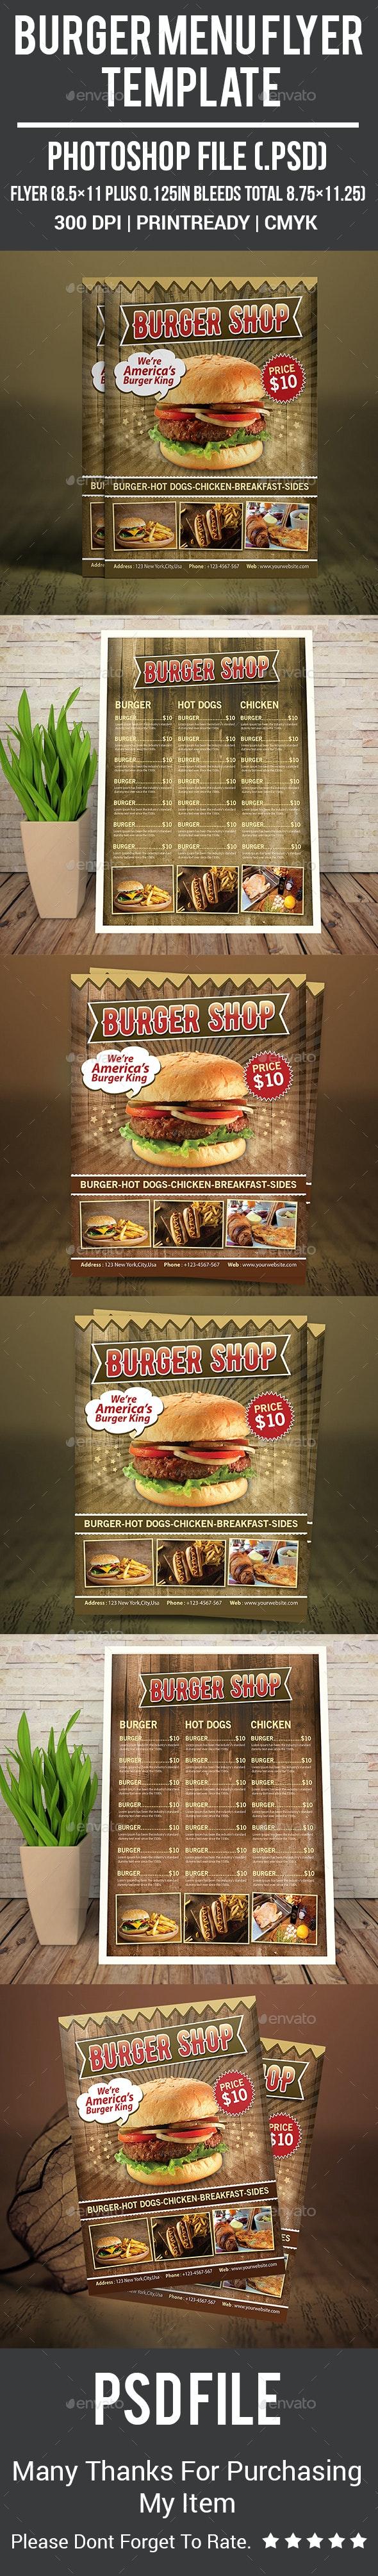 Burger Menu Flyer Template - Food Menus Print Templates